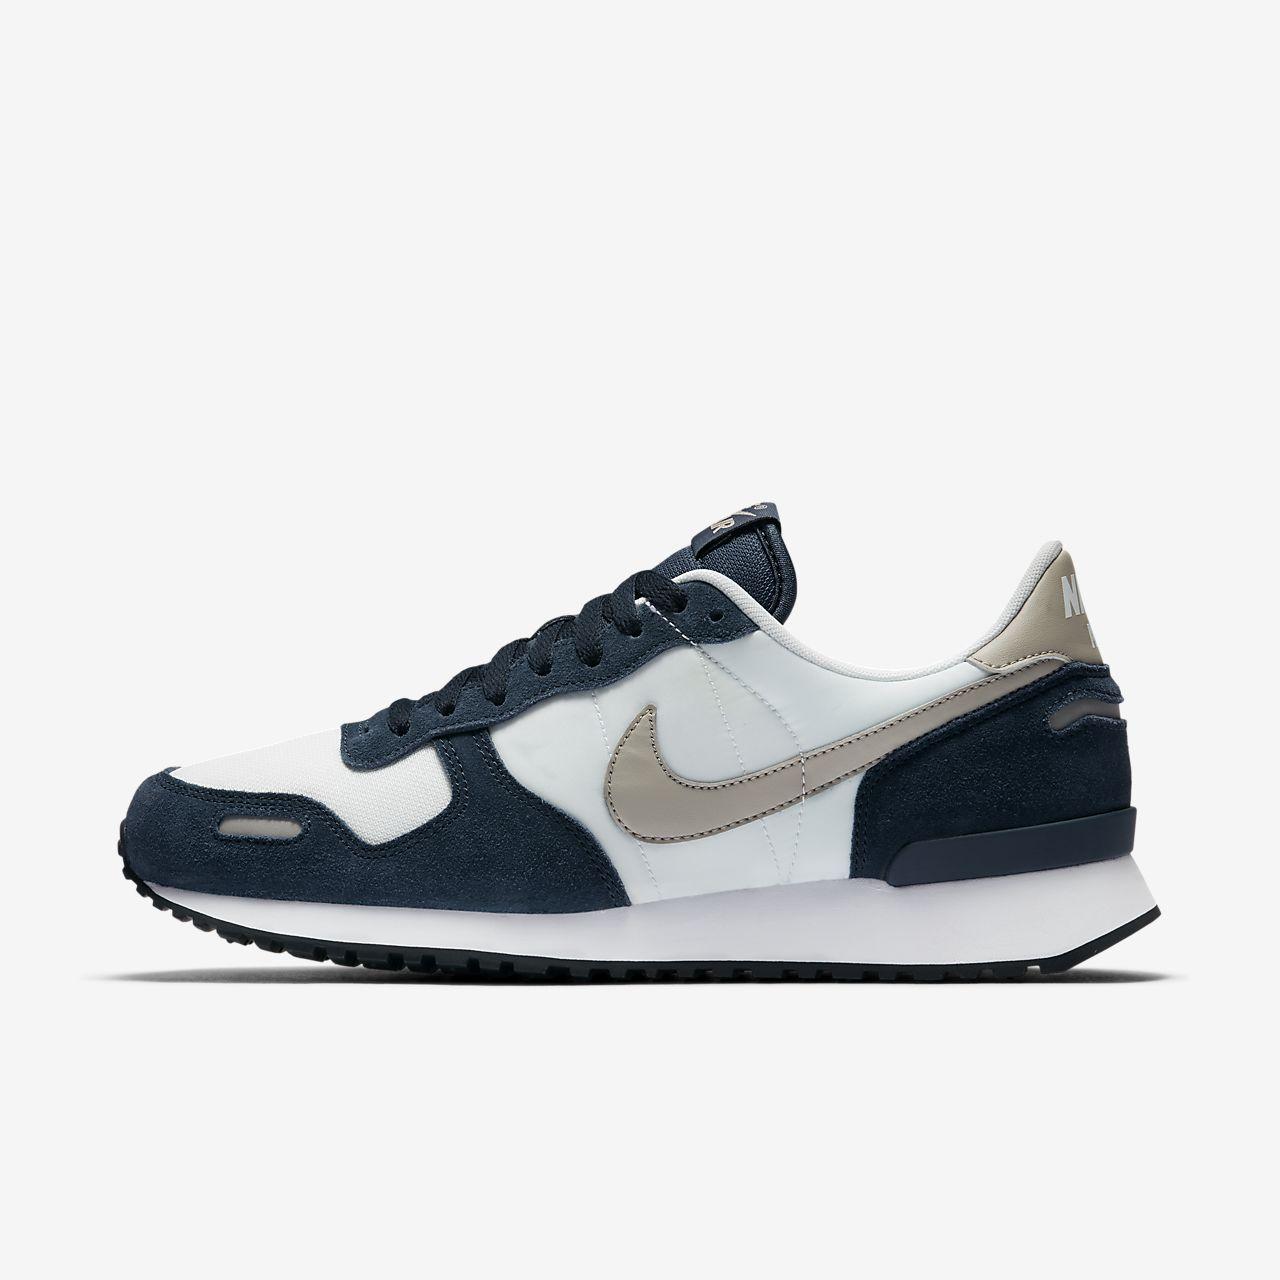 Chaussures Nike Noir Vortex 47 Hommes O2mPI